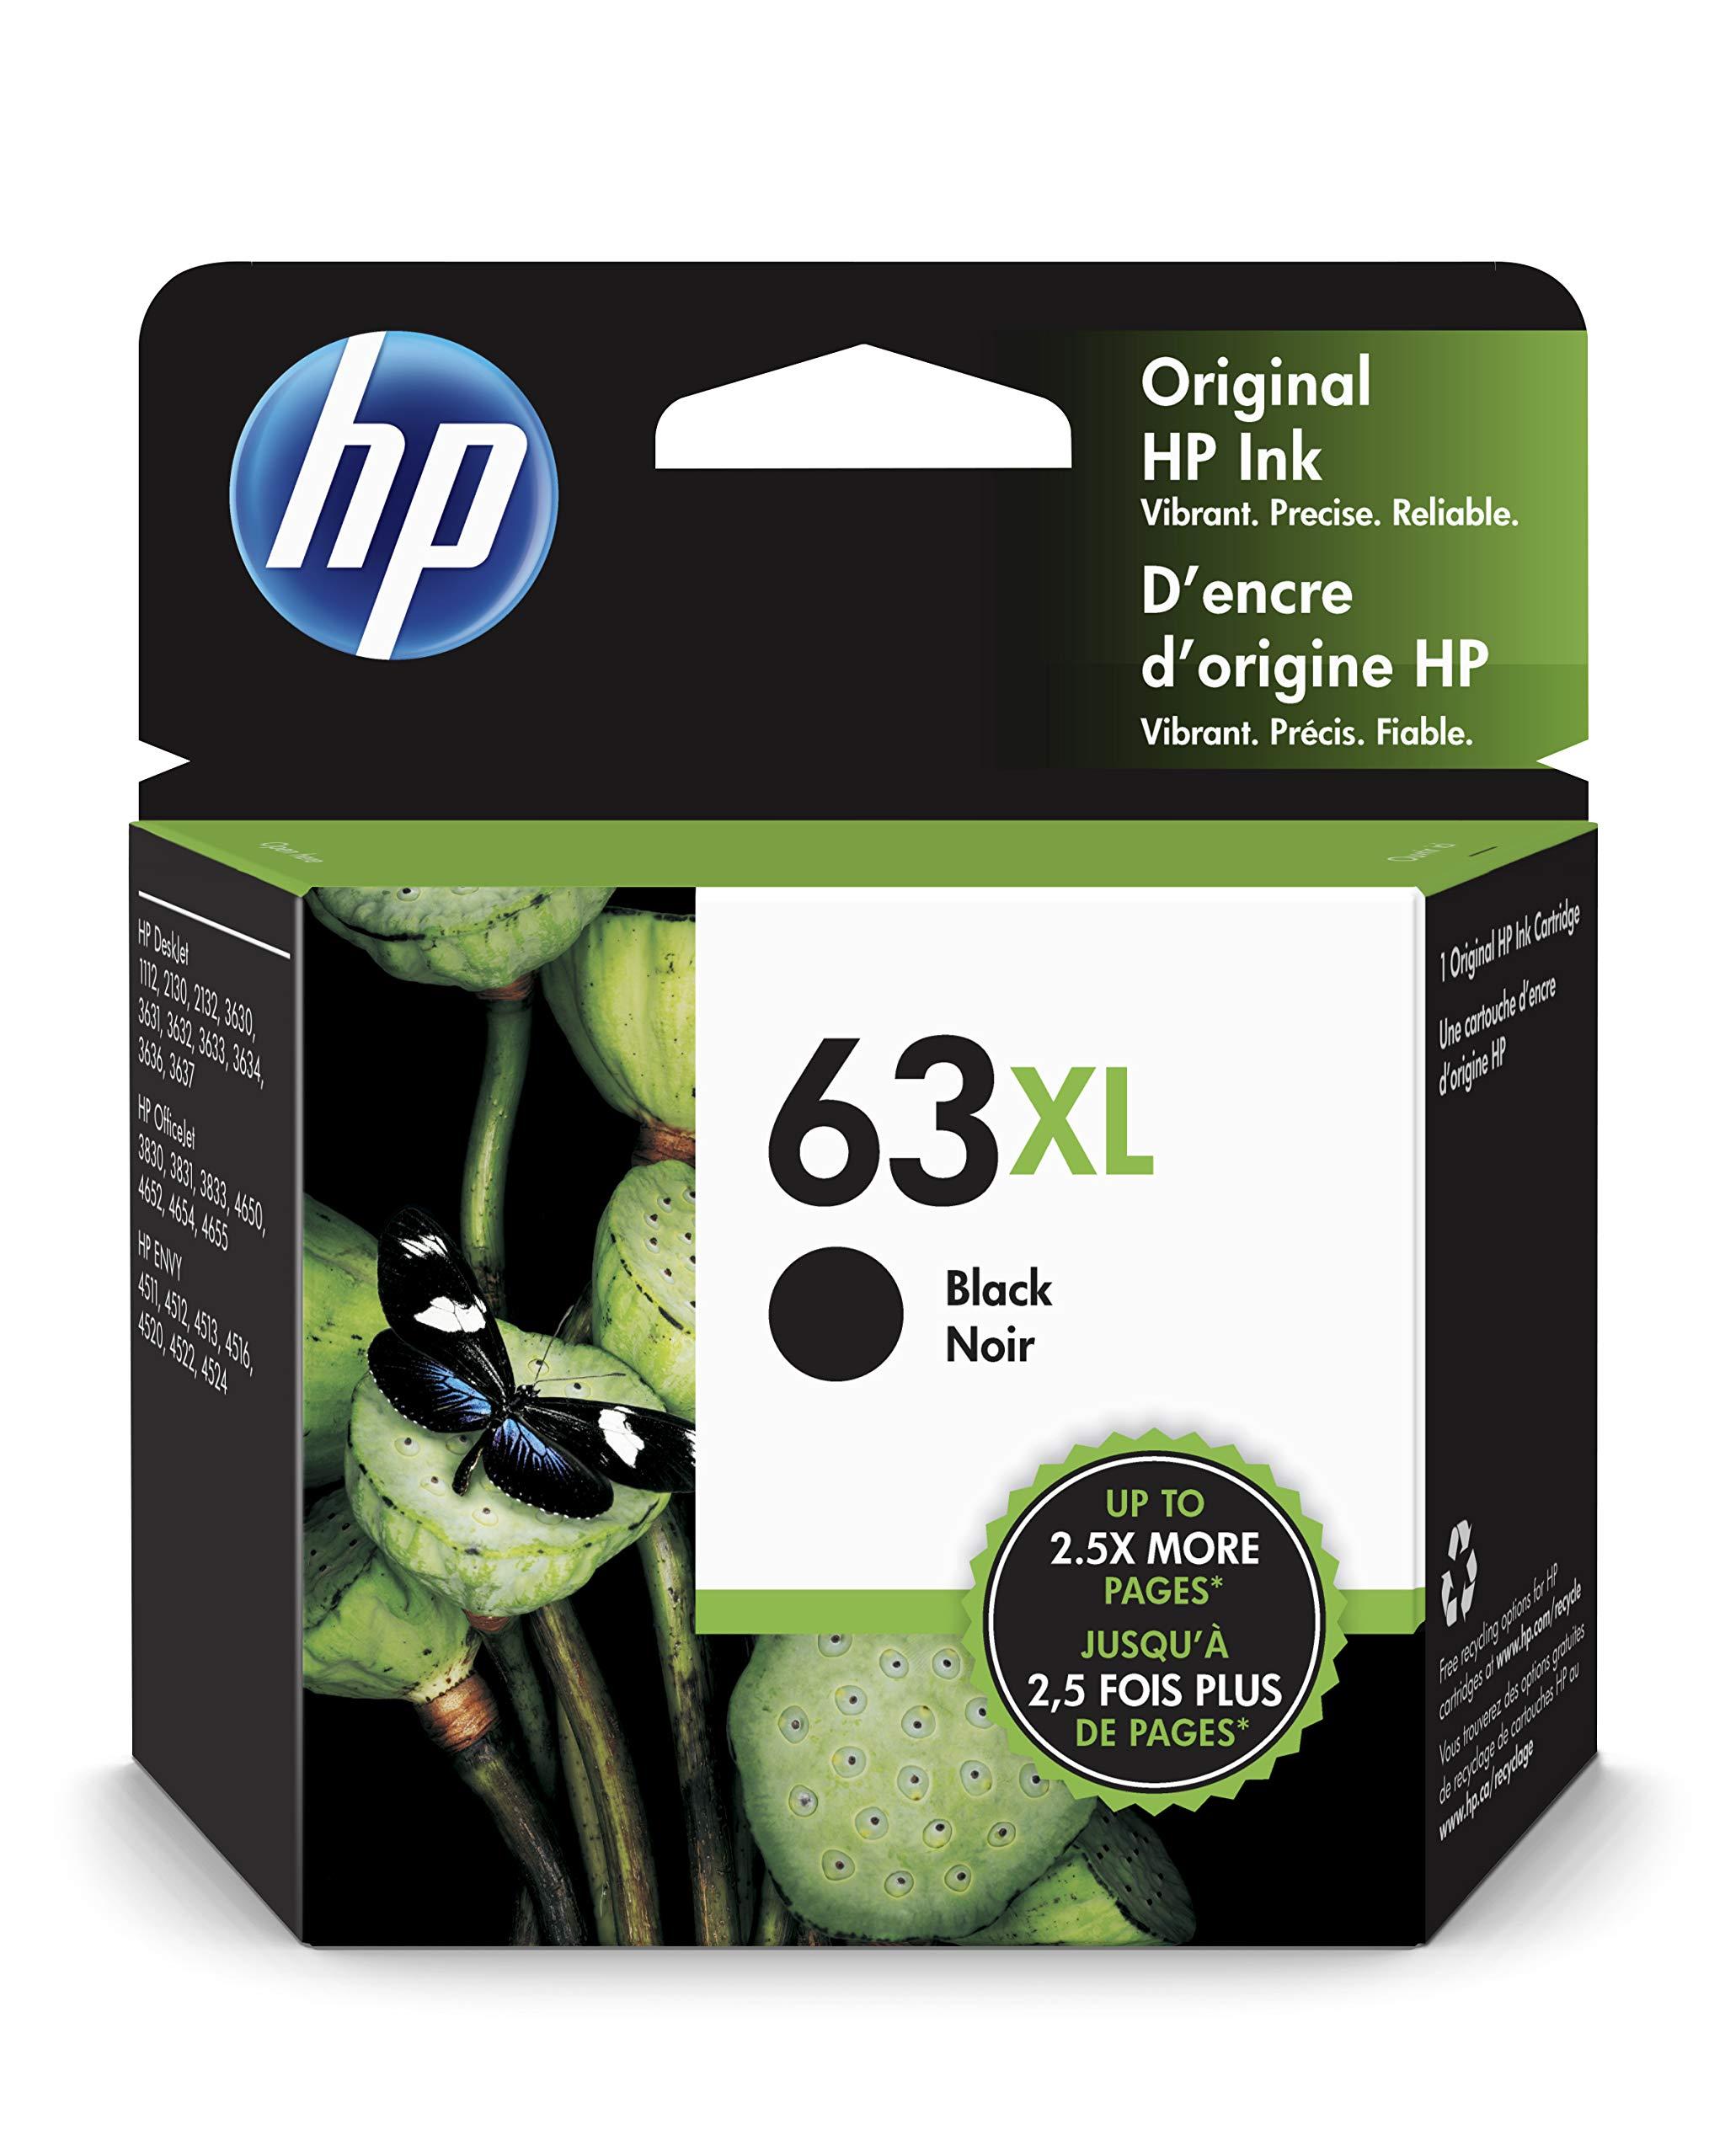 HP 63XL Black High Yield Original Ink Cartridge For HP DeskJet 1112, 2130, 2132, 3630, 3631, 3632, 3633, 3634, 3636, 3637, HP ENVY 4511, 4512, 4516, 4520, 4521, 4522, 4524, HP OfficeJet 3830, 3831, 3832, 3833, 4650, 4652, 4654, 4655 - F6U64AN#140 product image